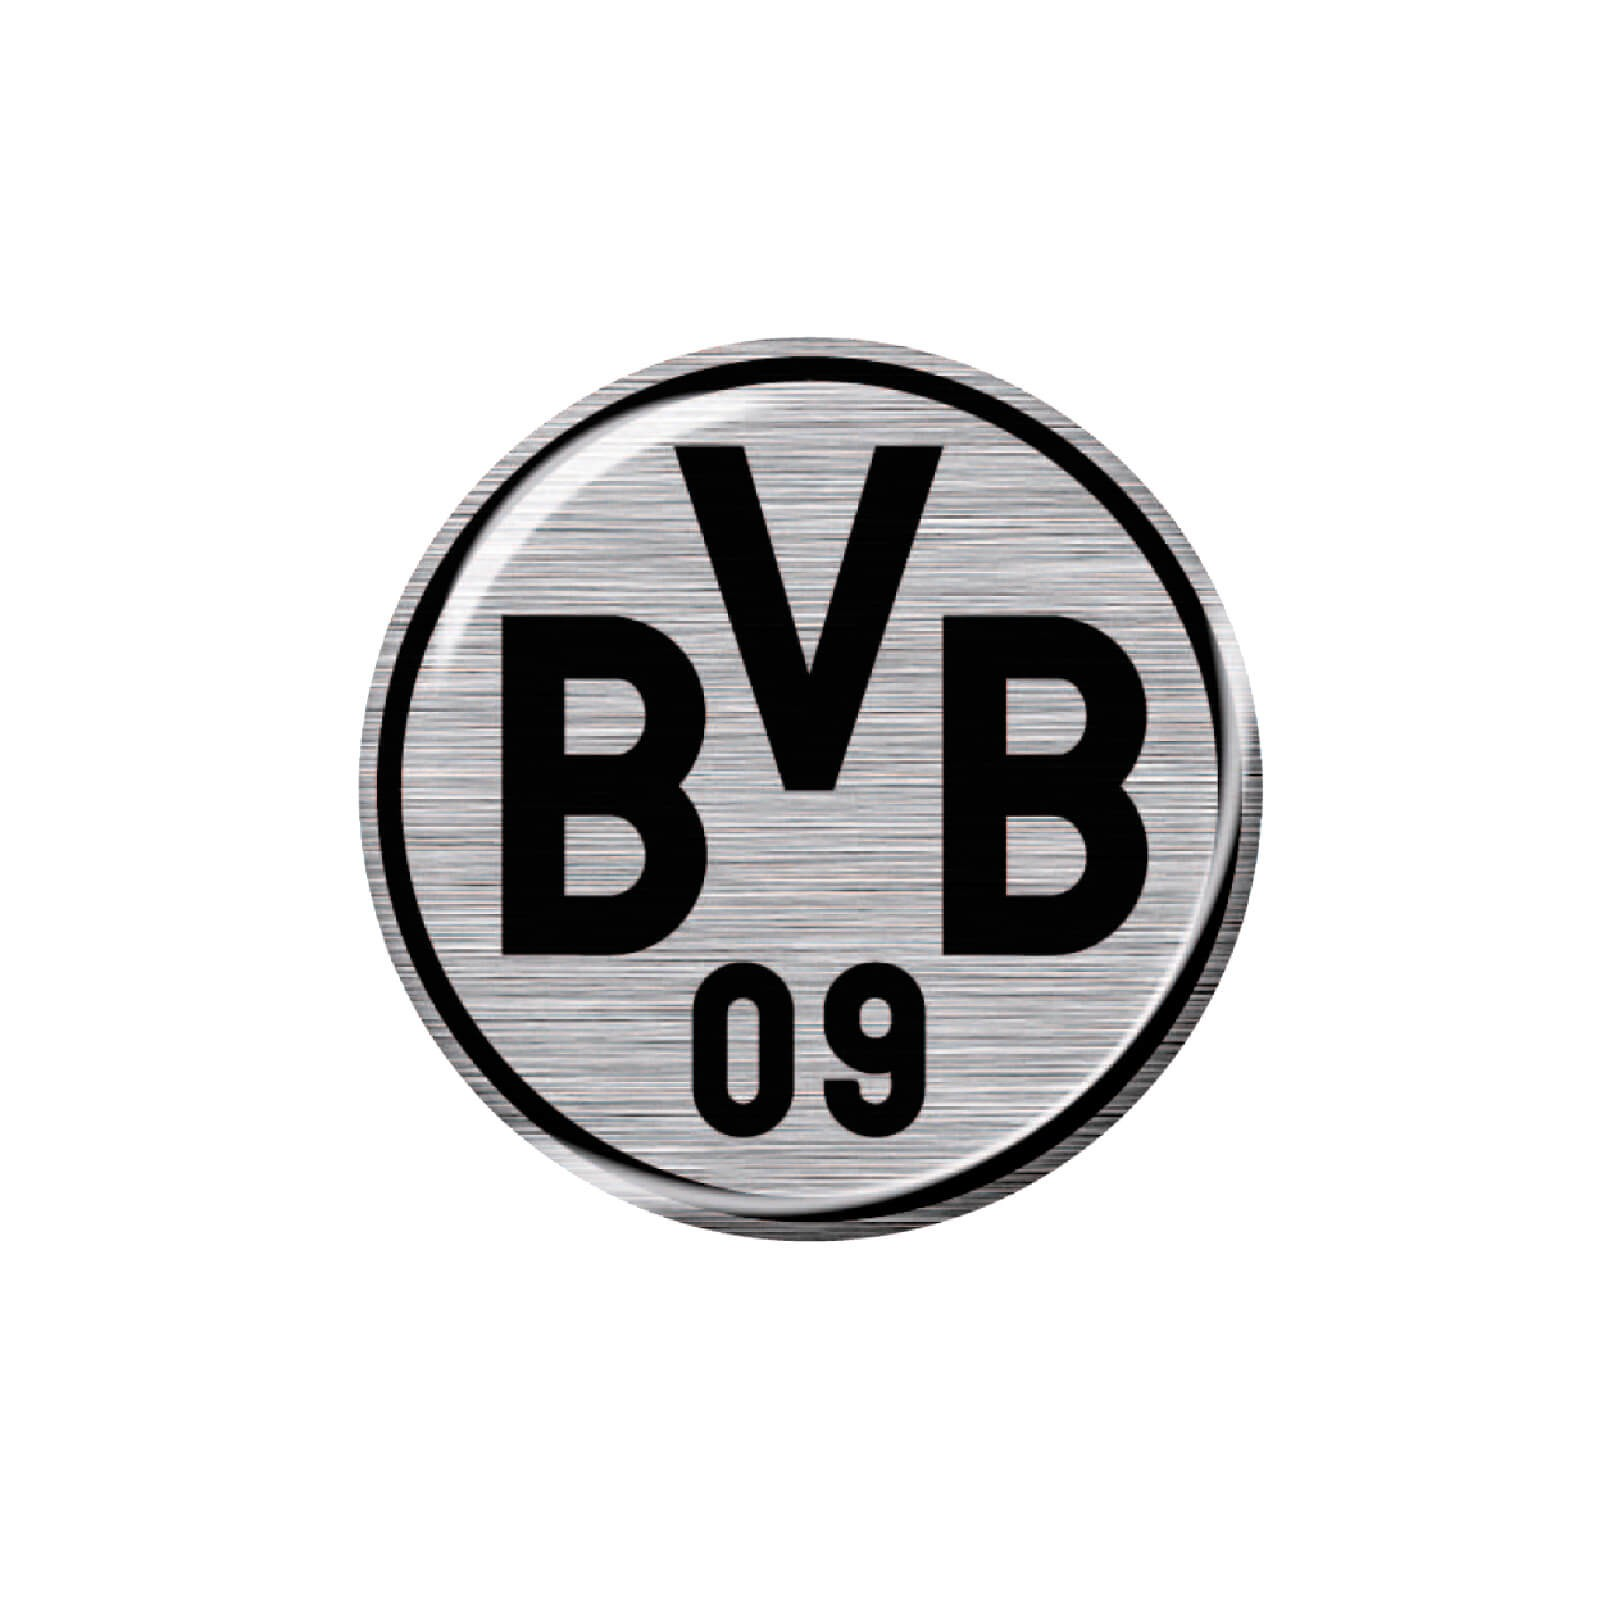 Borussia Dortmund 3D Autoaufkleber Logo 6 Cm - Silber/schwarz